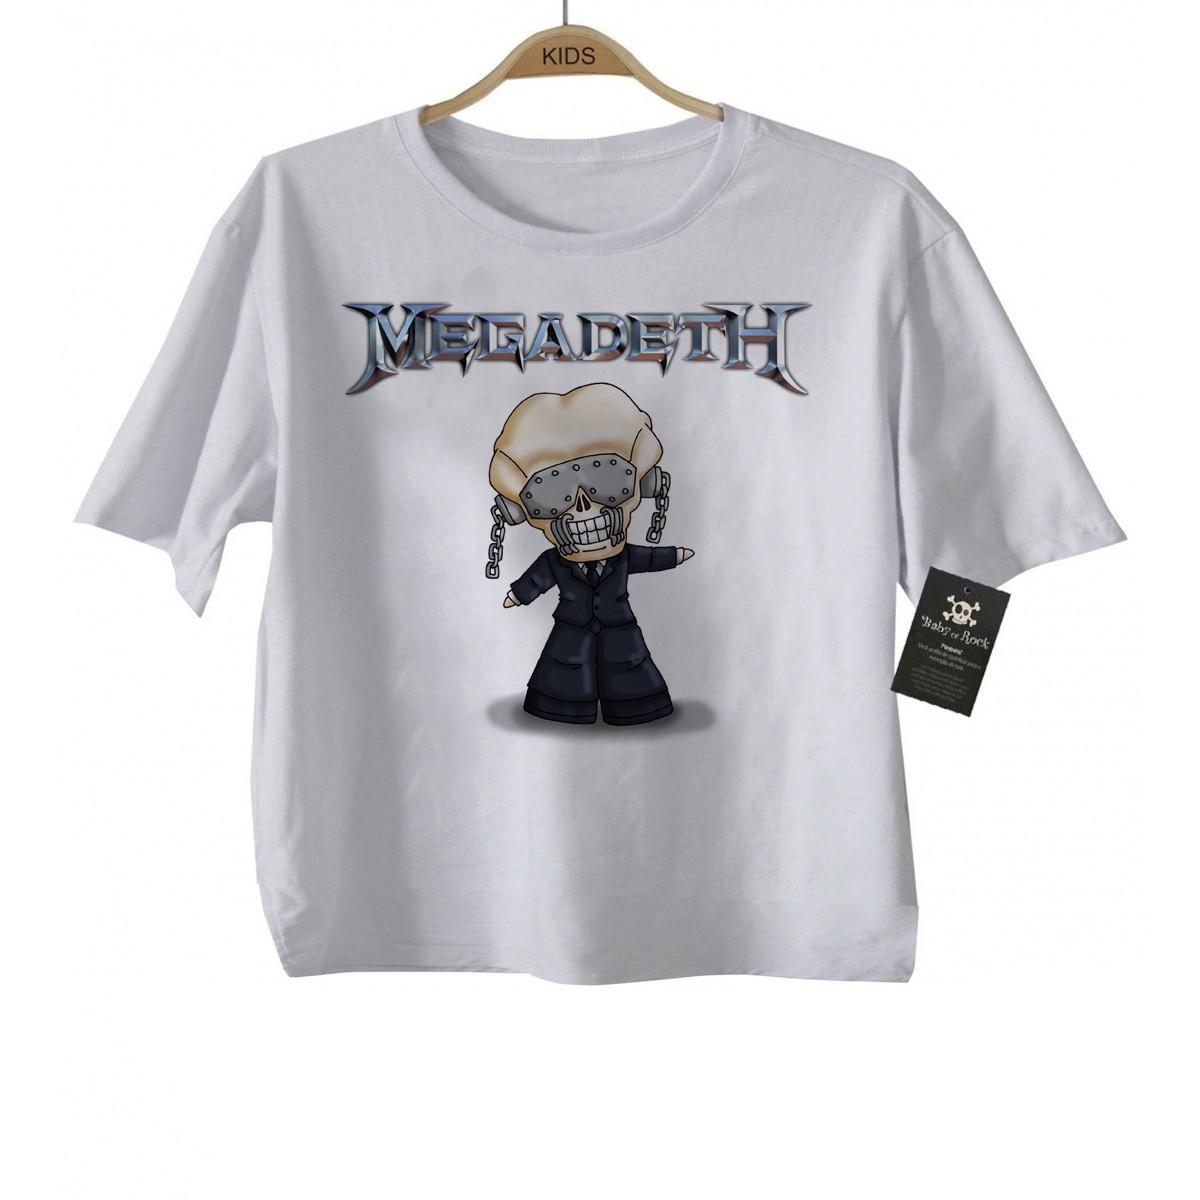 Camiseta de Rock Infantil -  Megadeth - White  - Baby Monster S/A